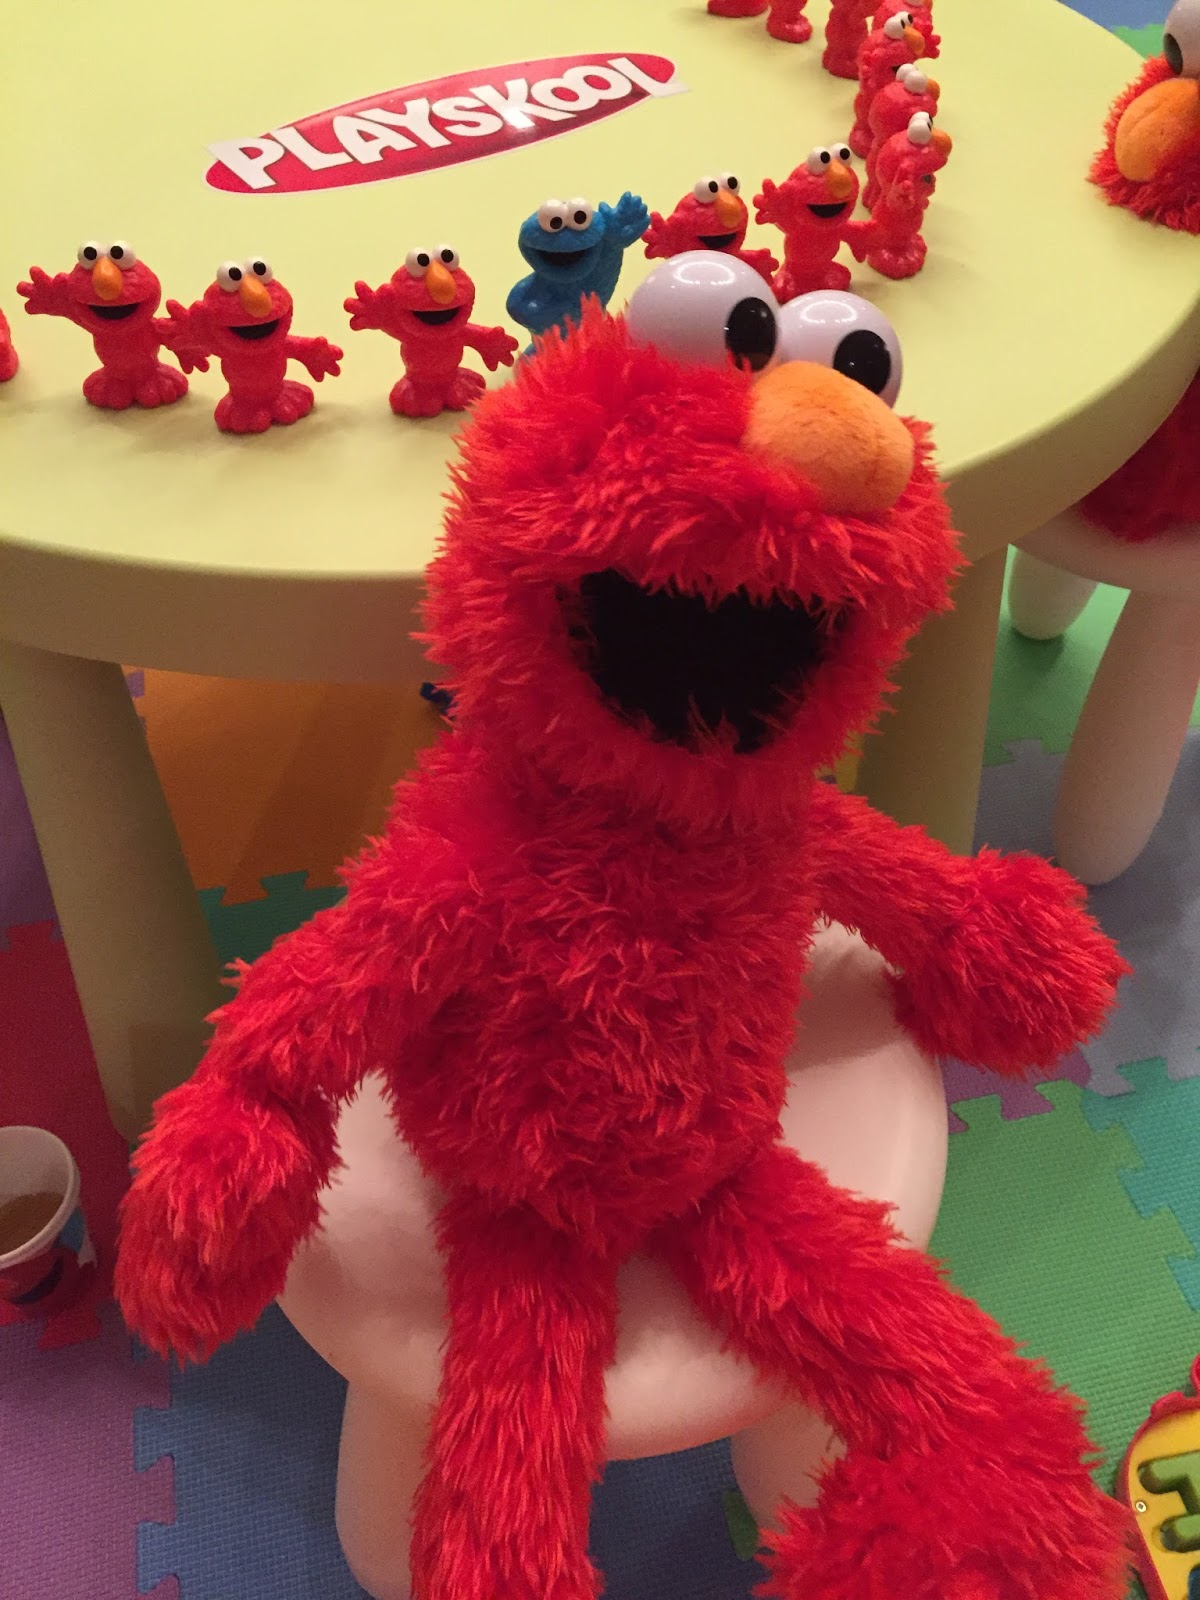 When Tara Met Blog Meet The New Play All Day Elmo Toy